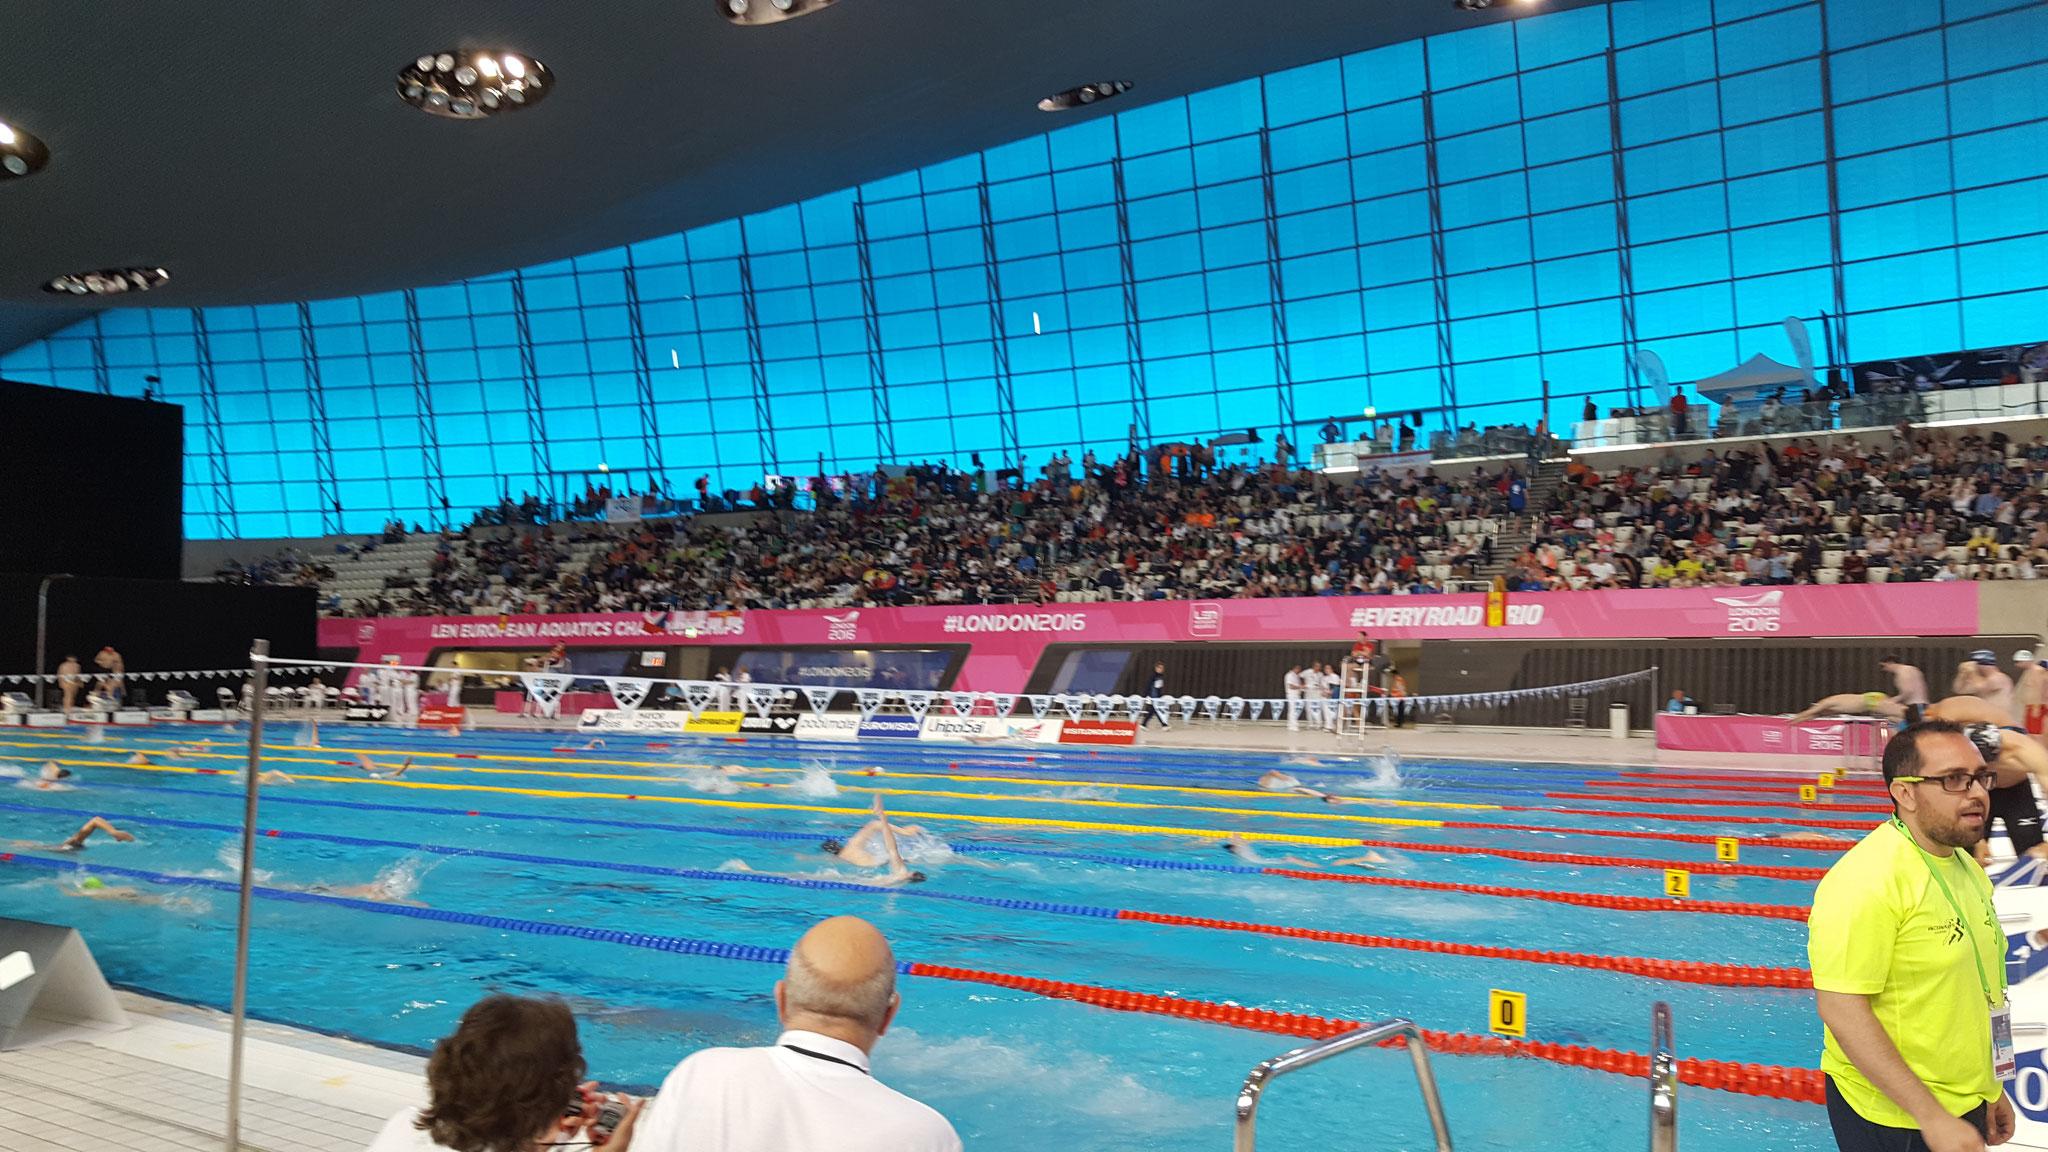 Schwimm-EM 2016